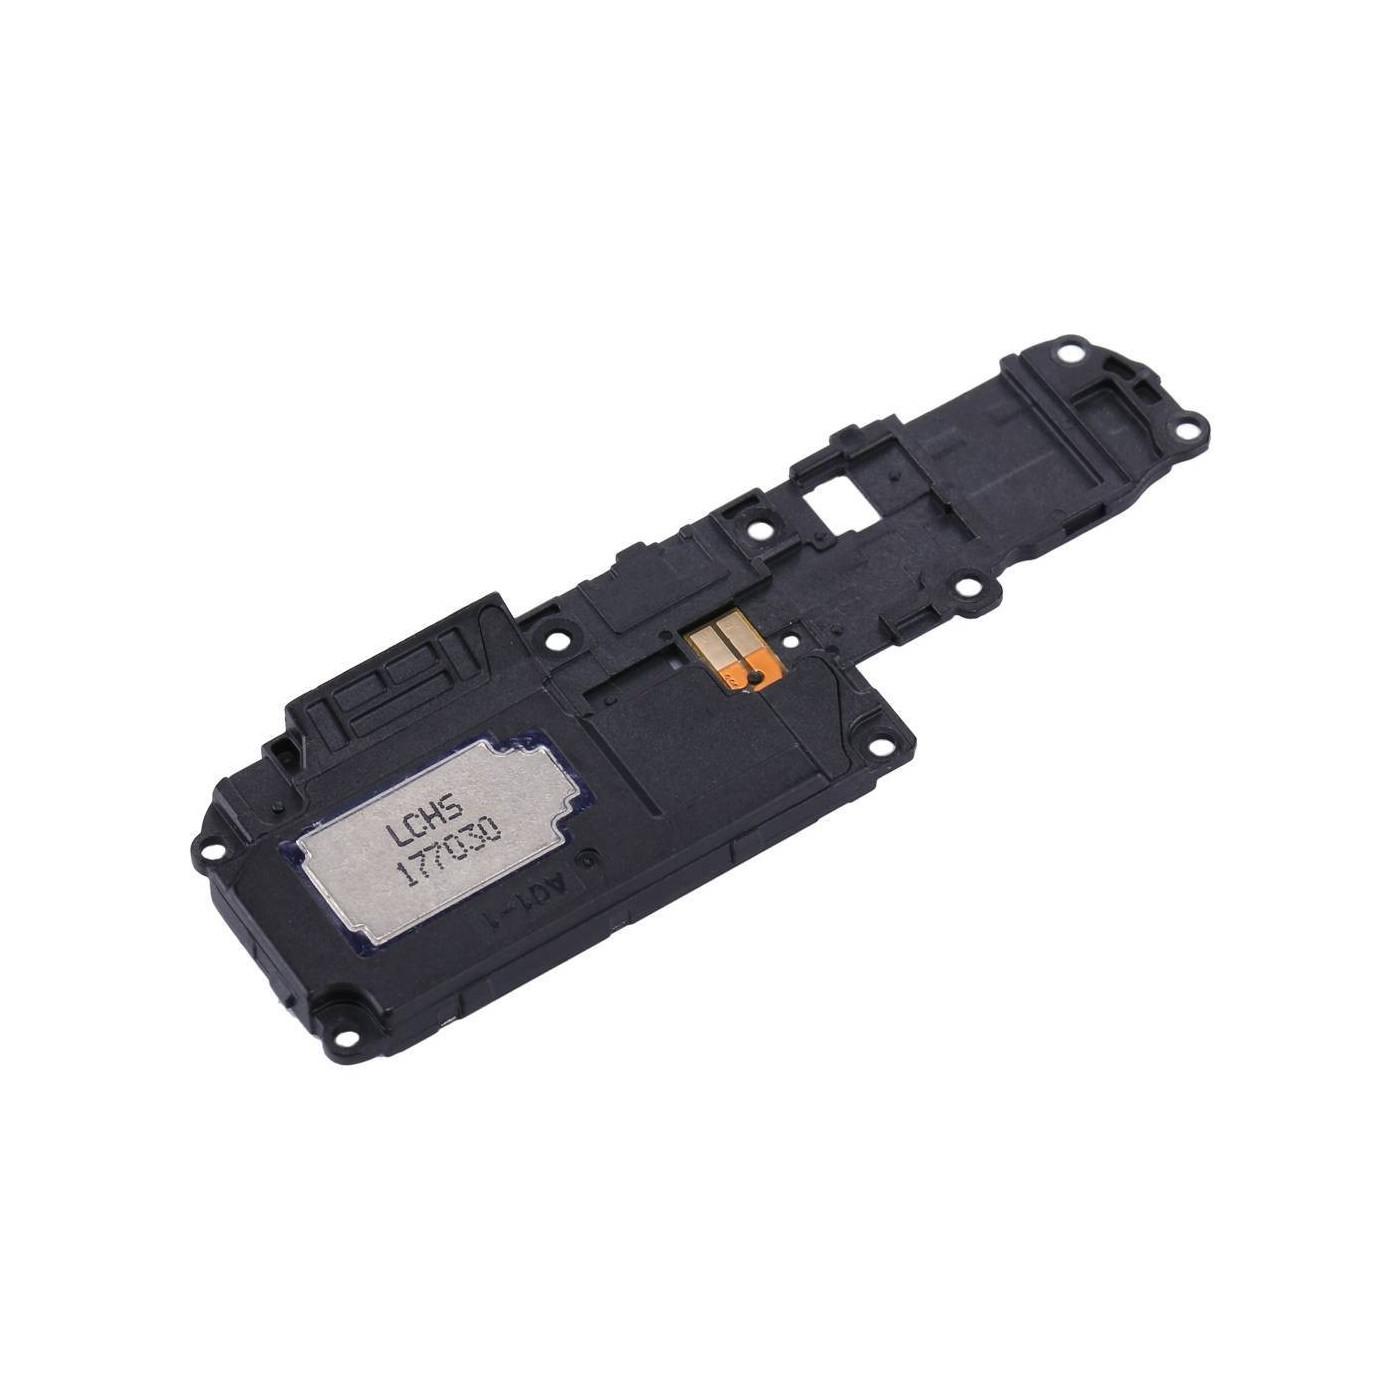 Lauter Lautsprecher Summer Huawei Honor 9 Lite ringer weniger Lautsprecherboxen